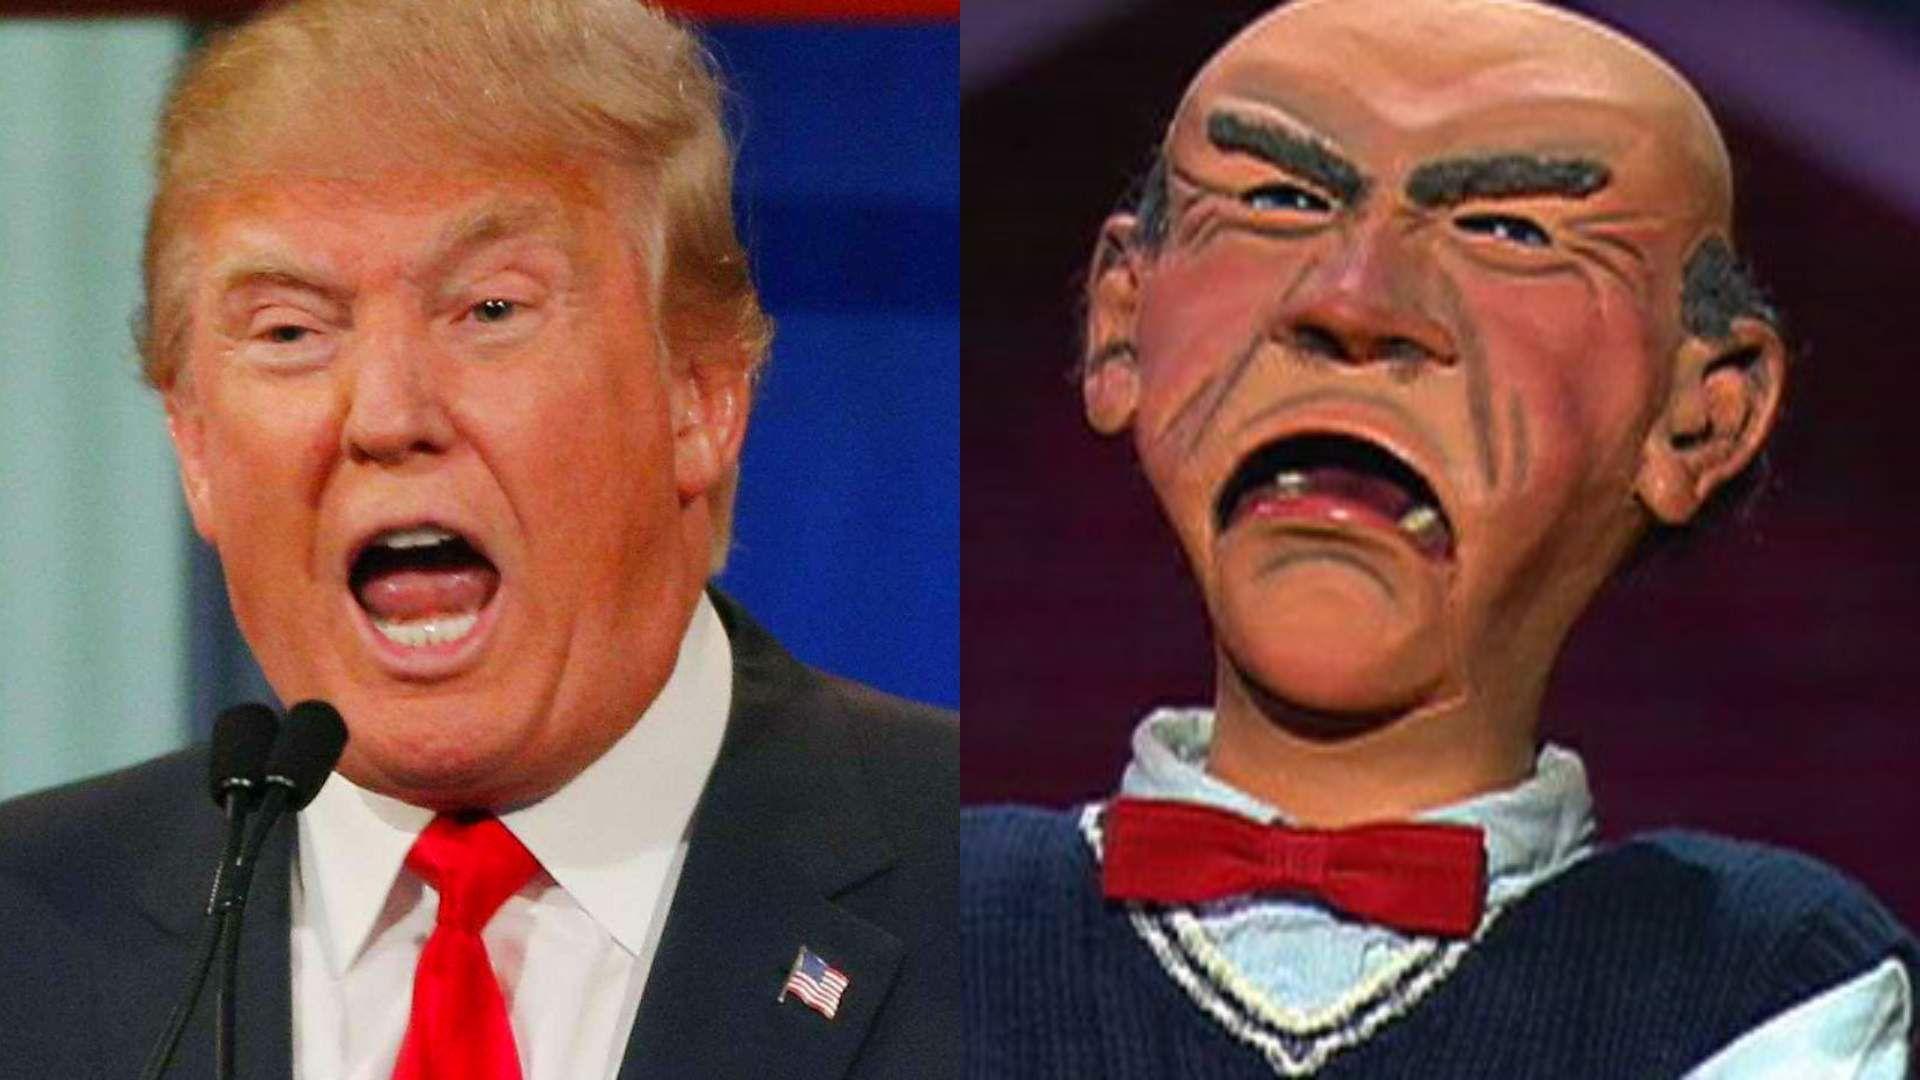 Jeff Dunham Walter Trump